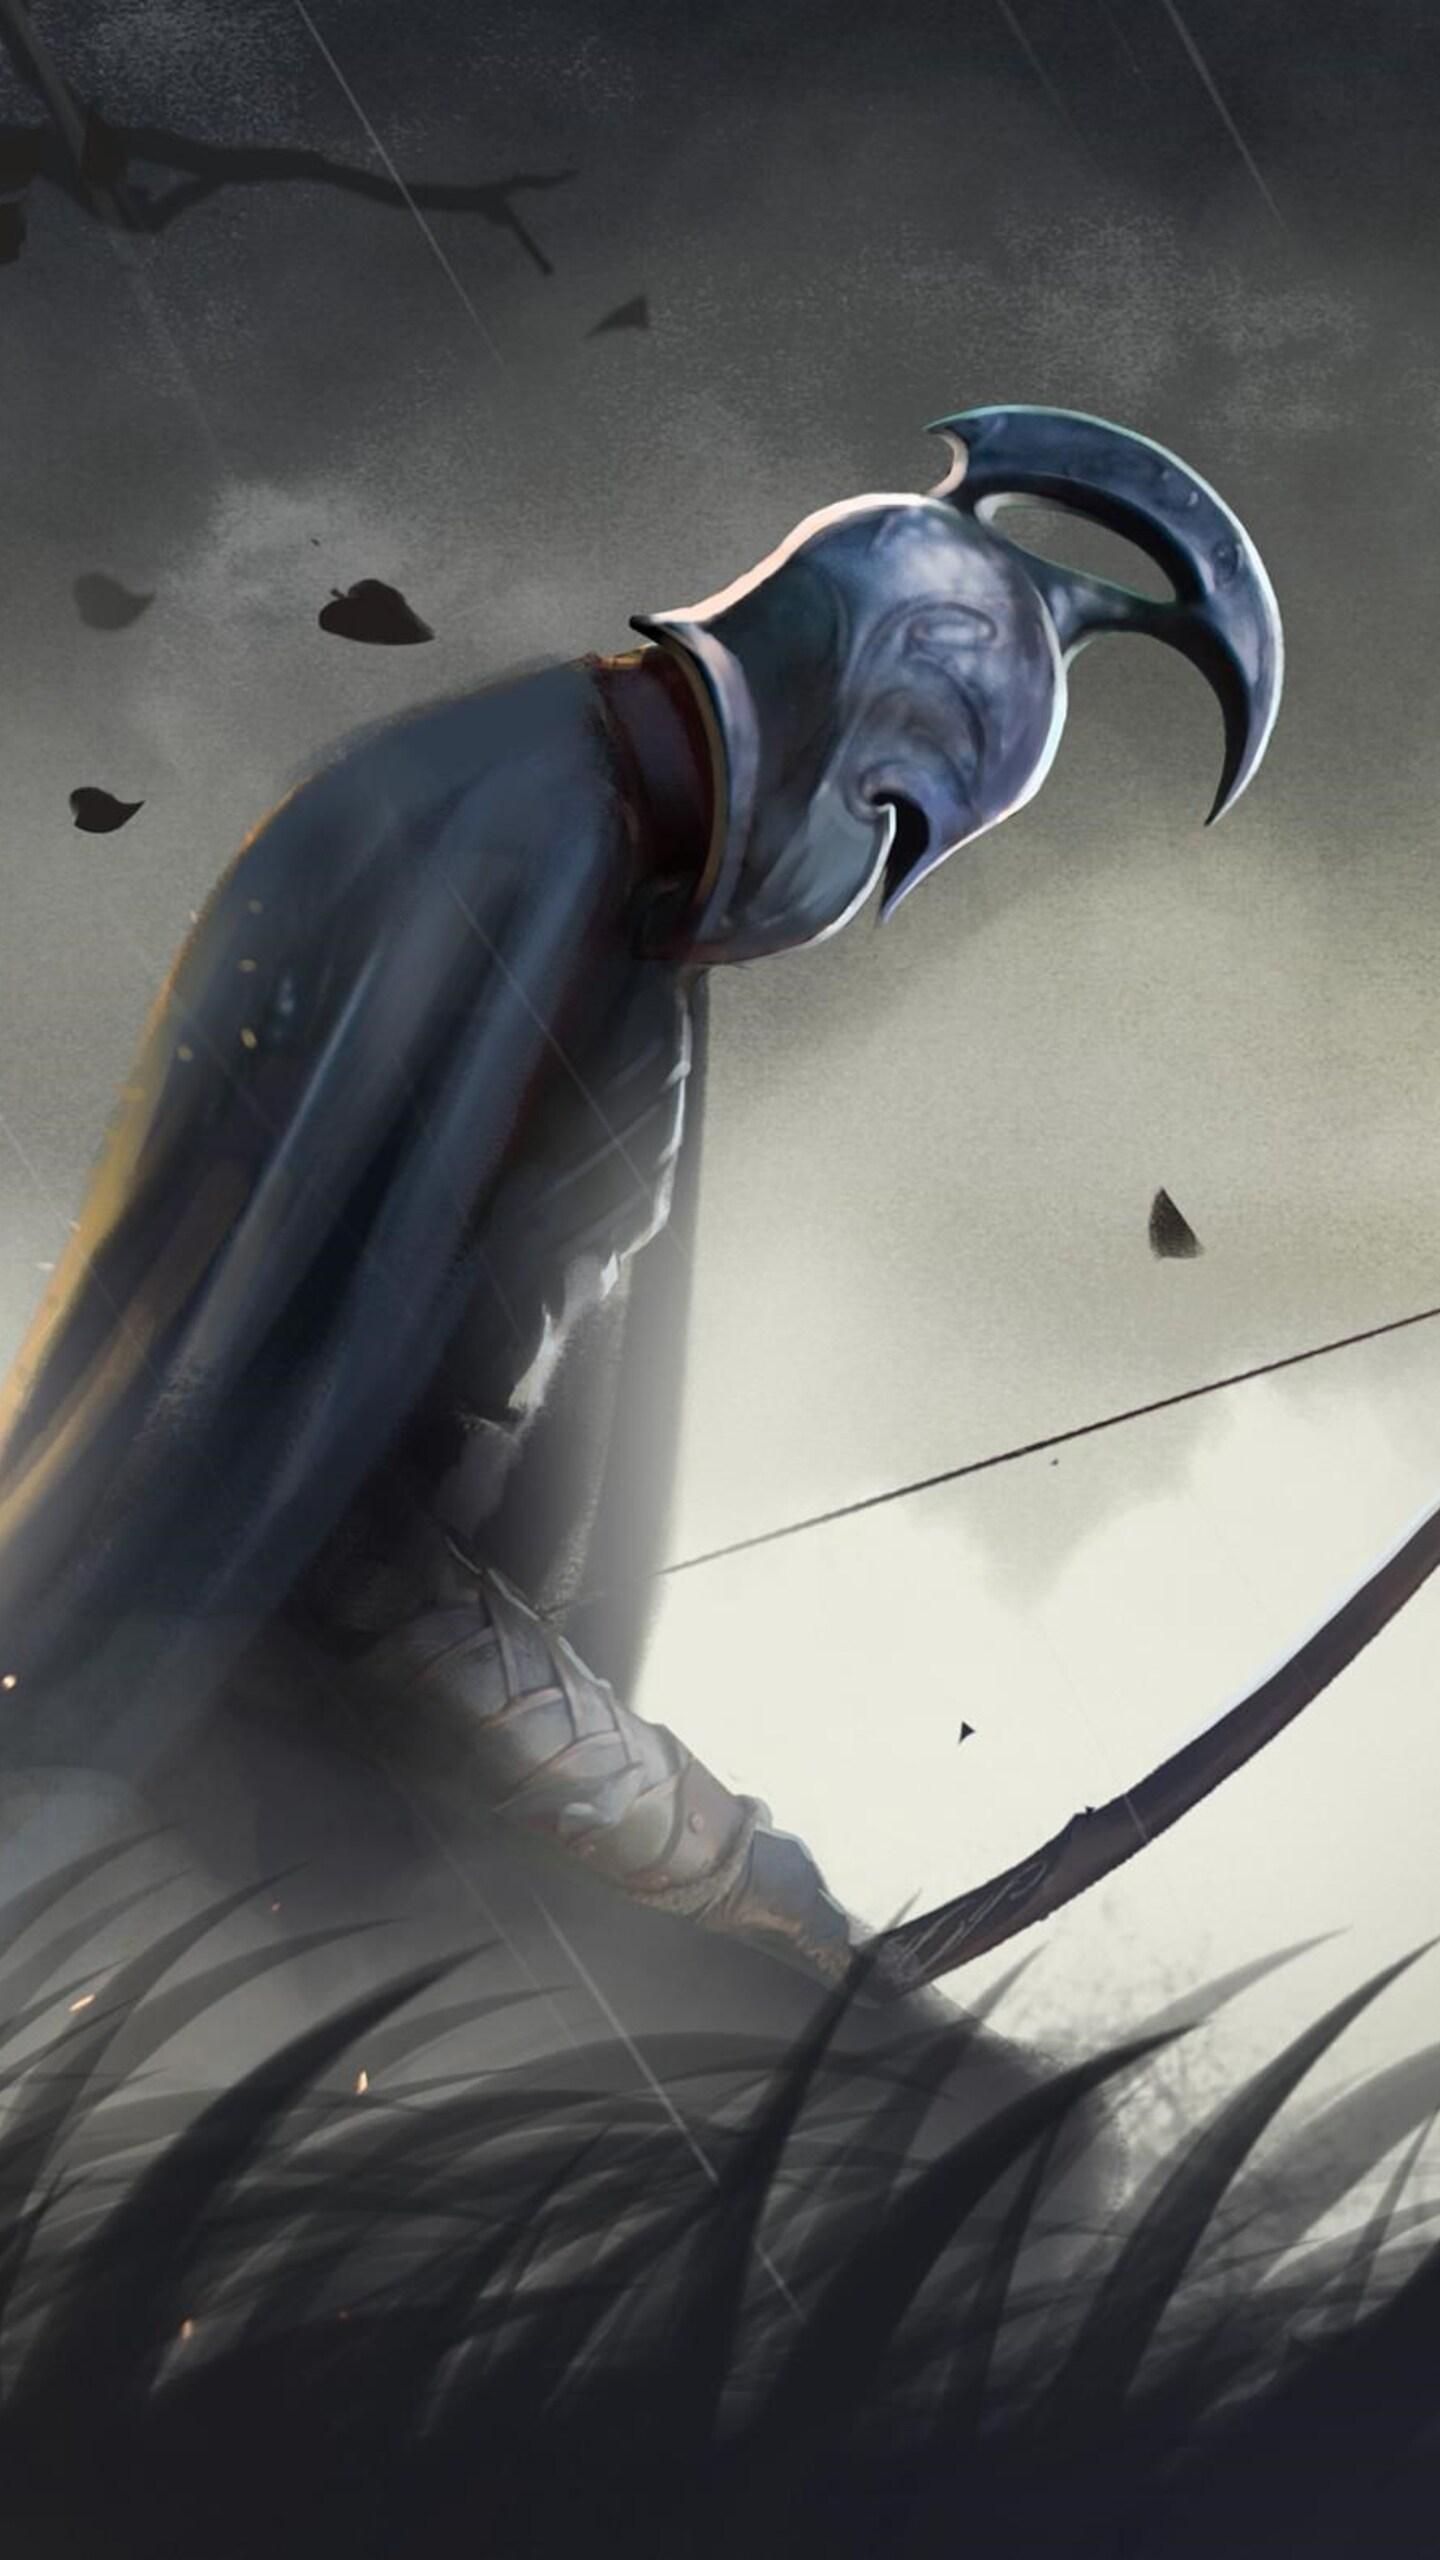 spartan-real-warrior.jpg